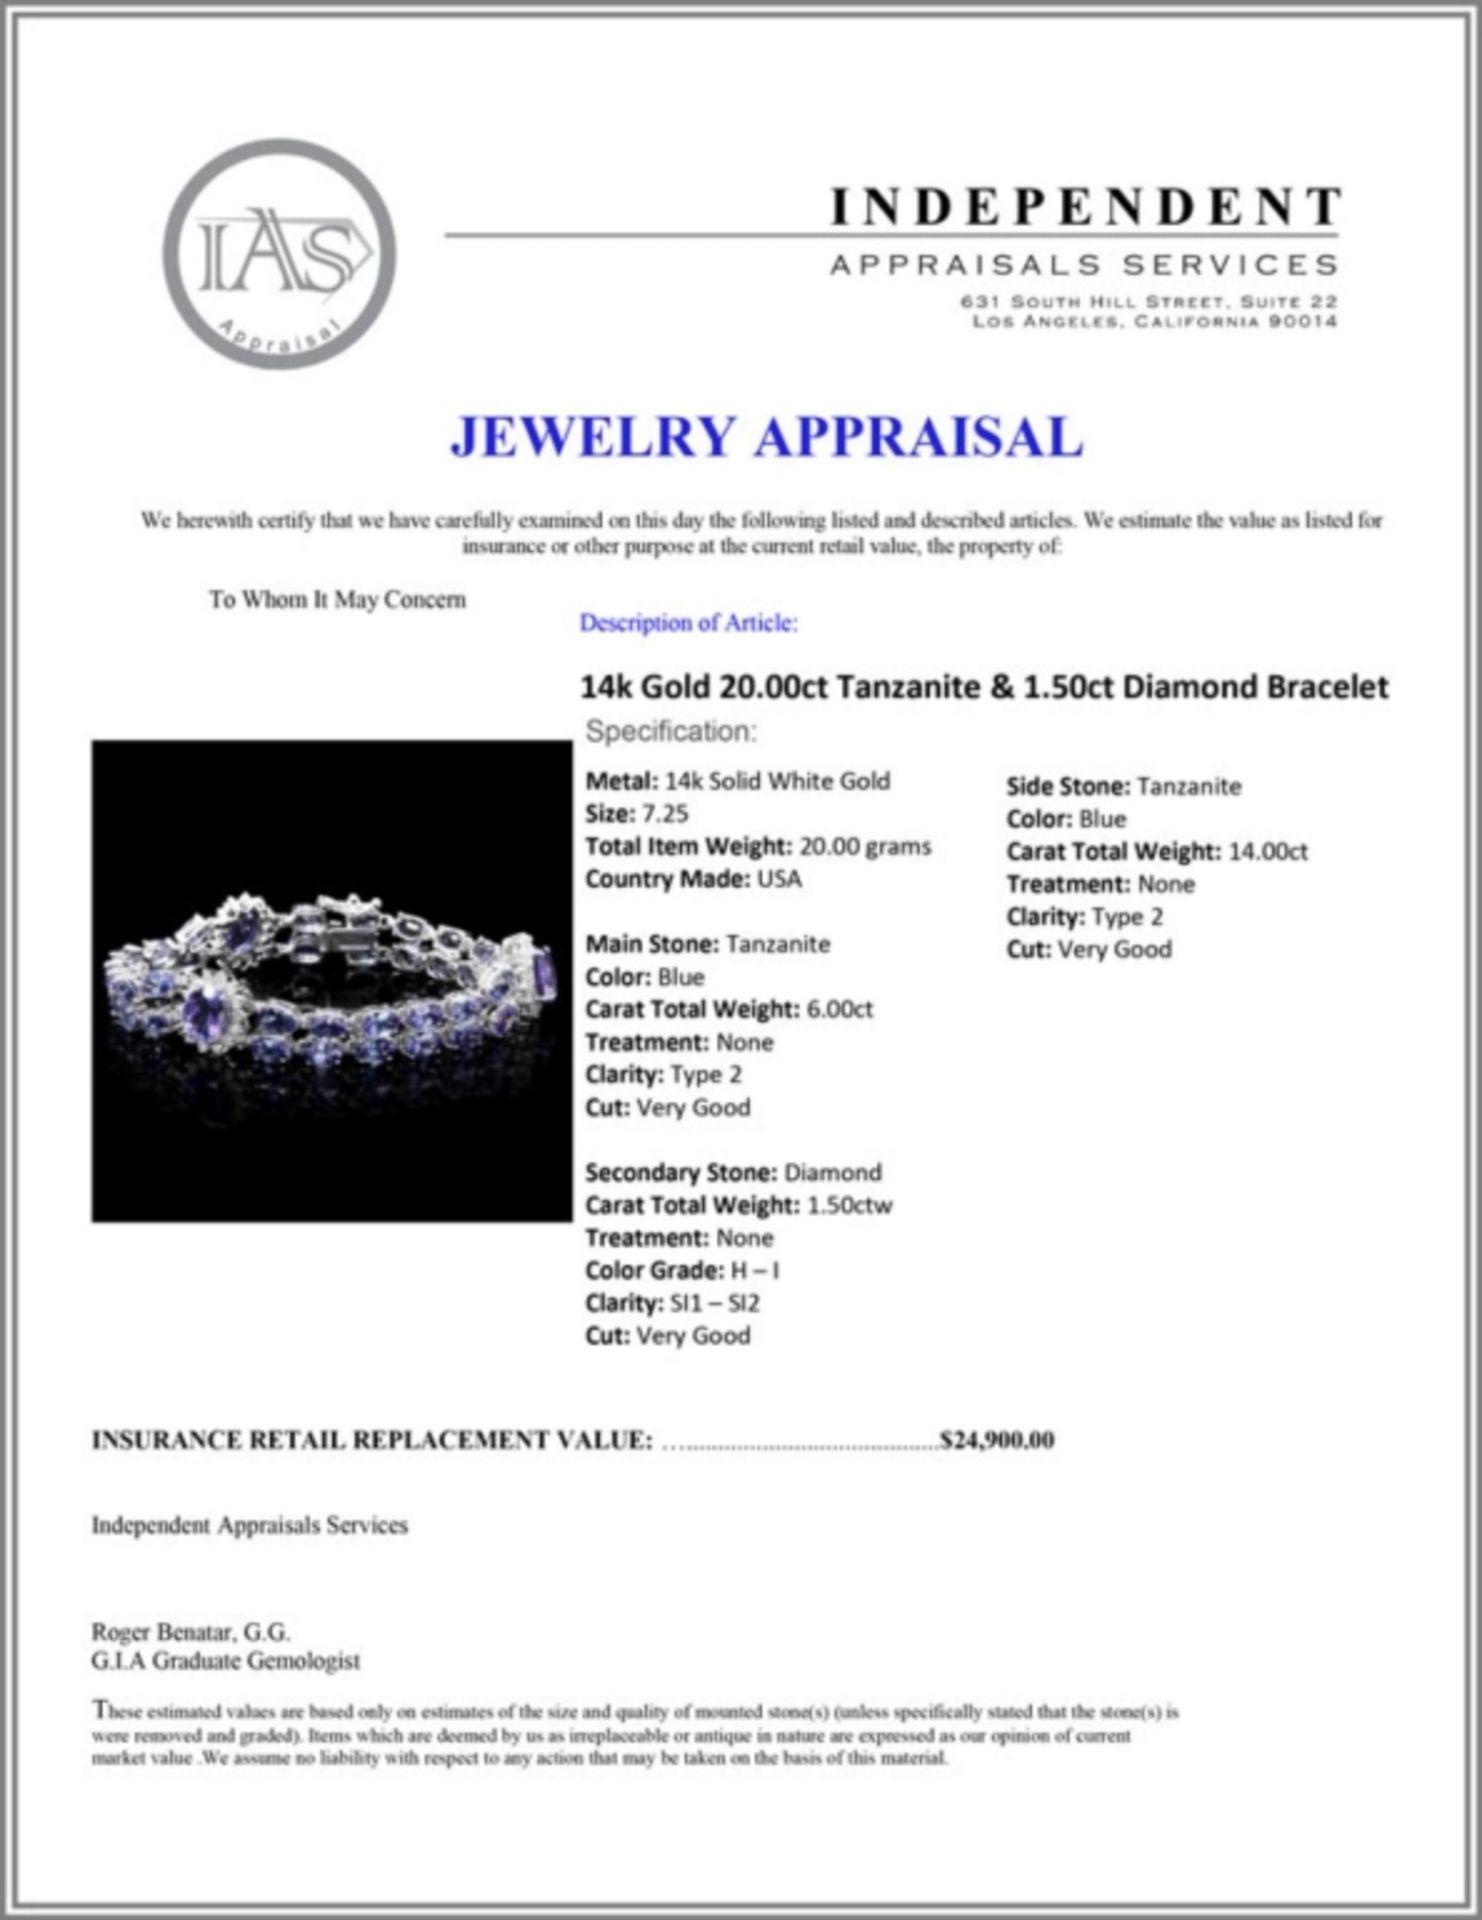 `14k Gold 20.00ct Tanzanite & 1.50ct Diamond Brace - Image 4 of 4